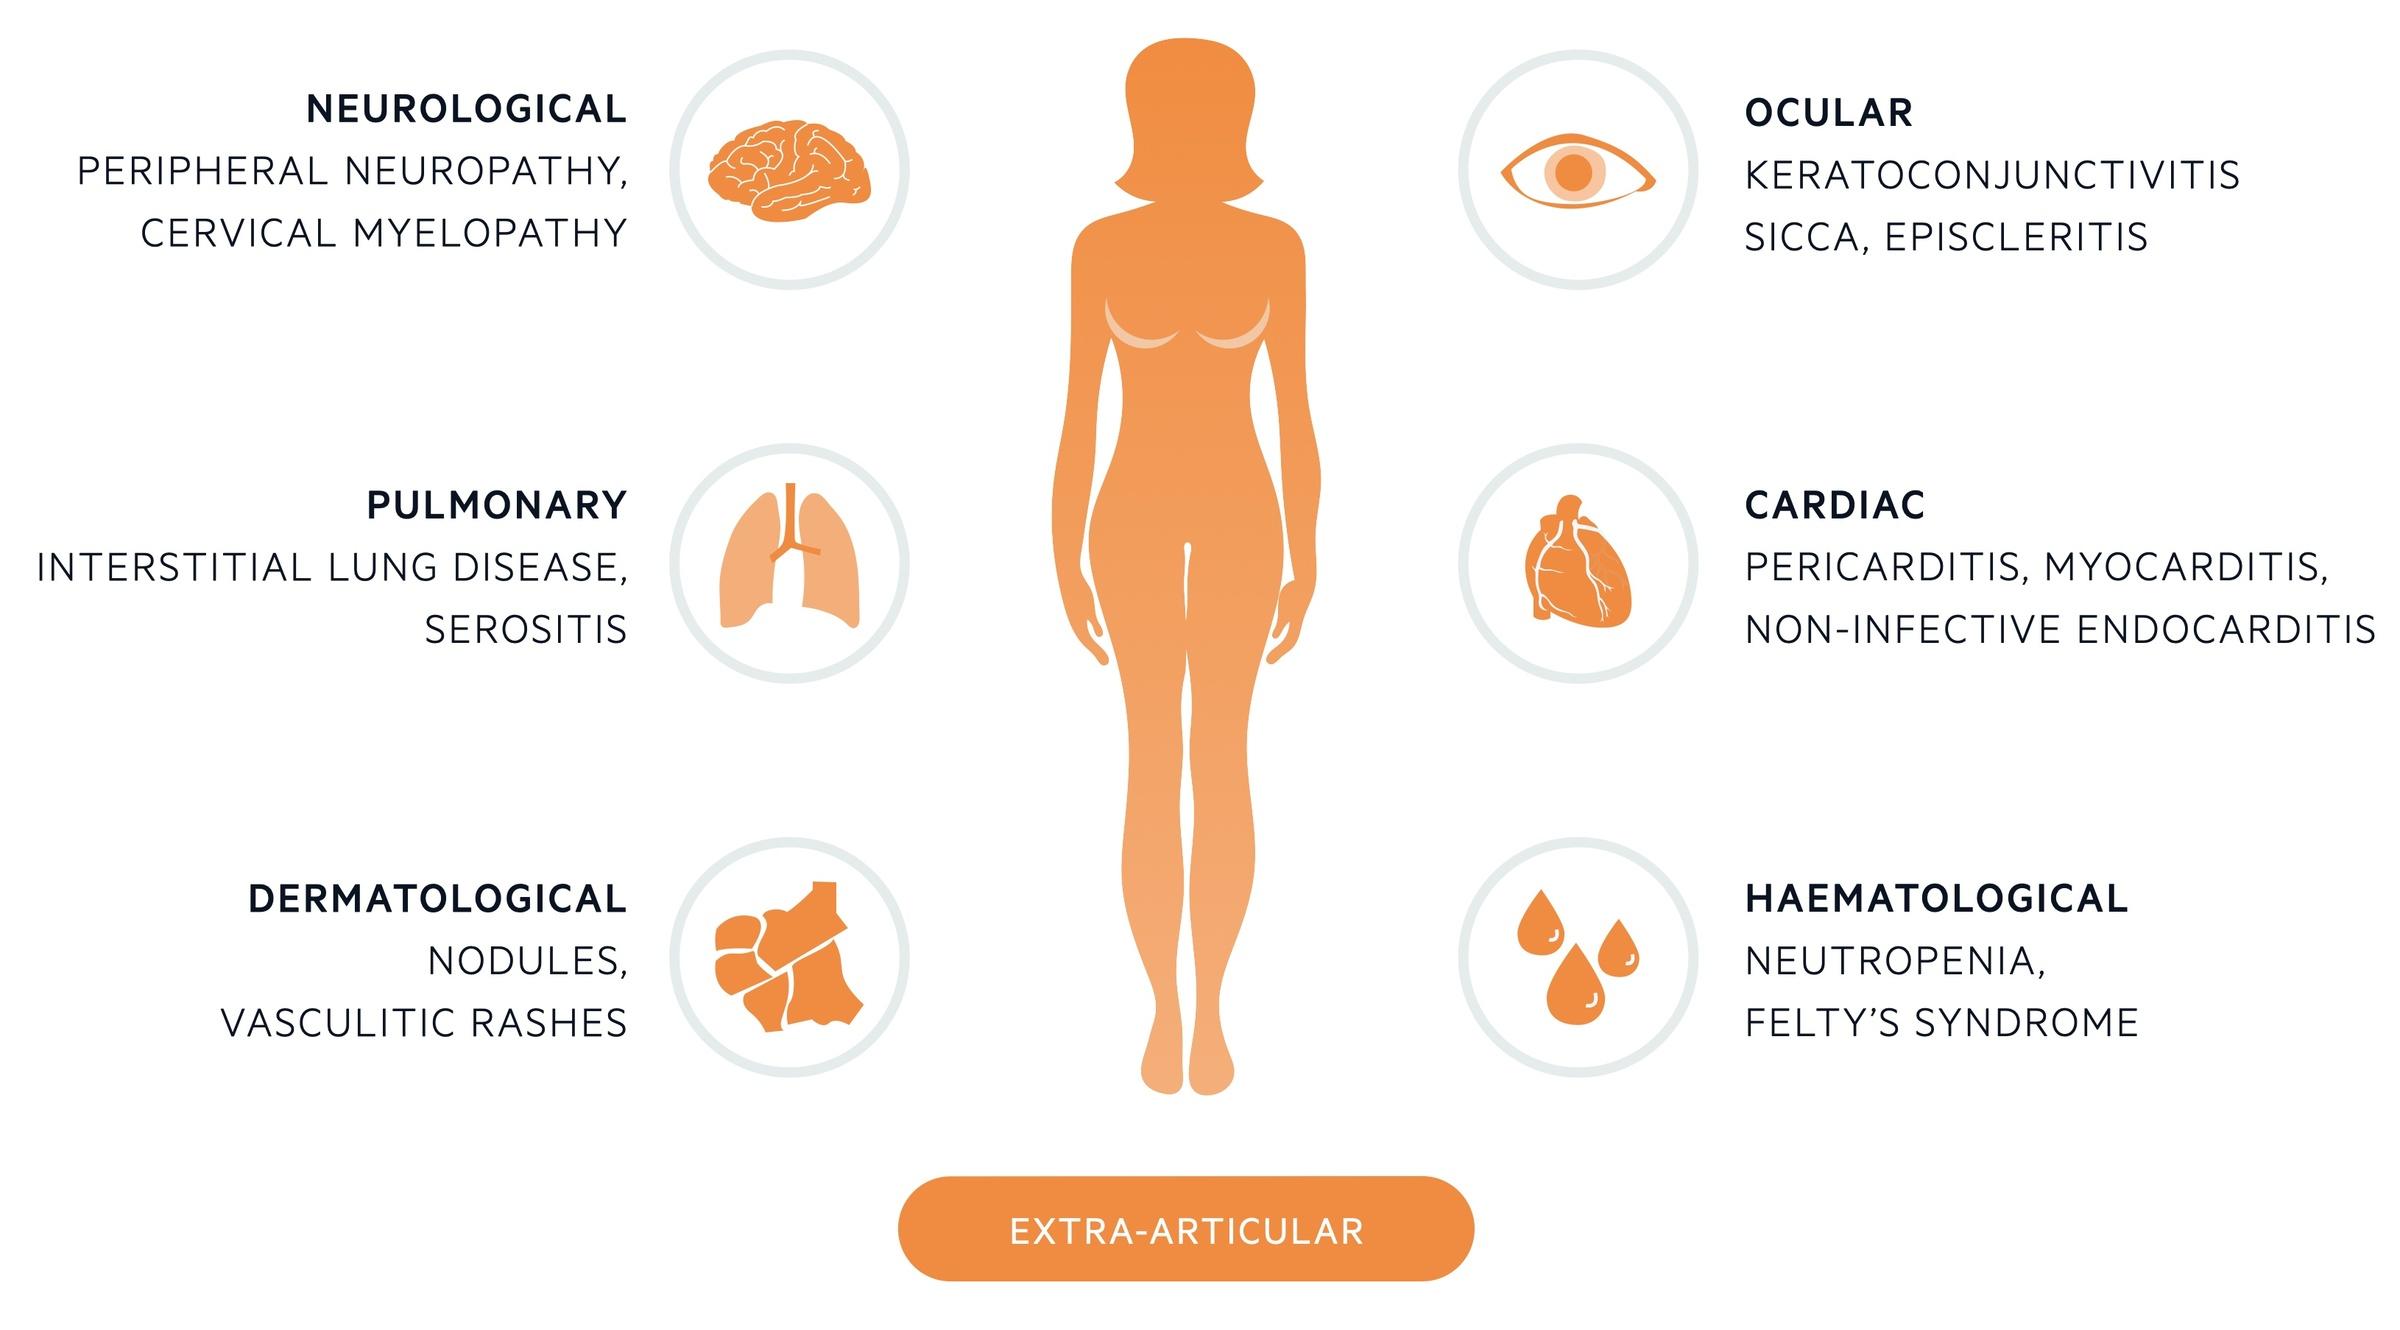 Extra-articular manifestations of rheumatoid arthritis